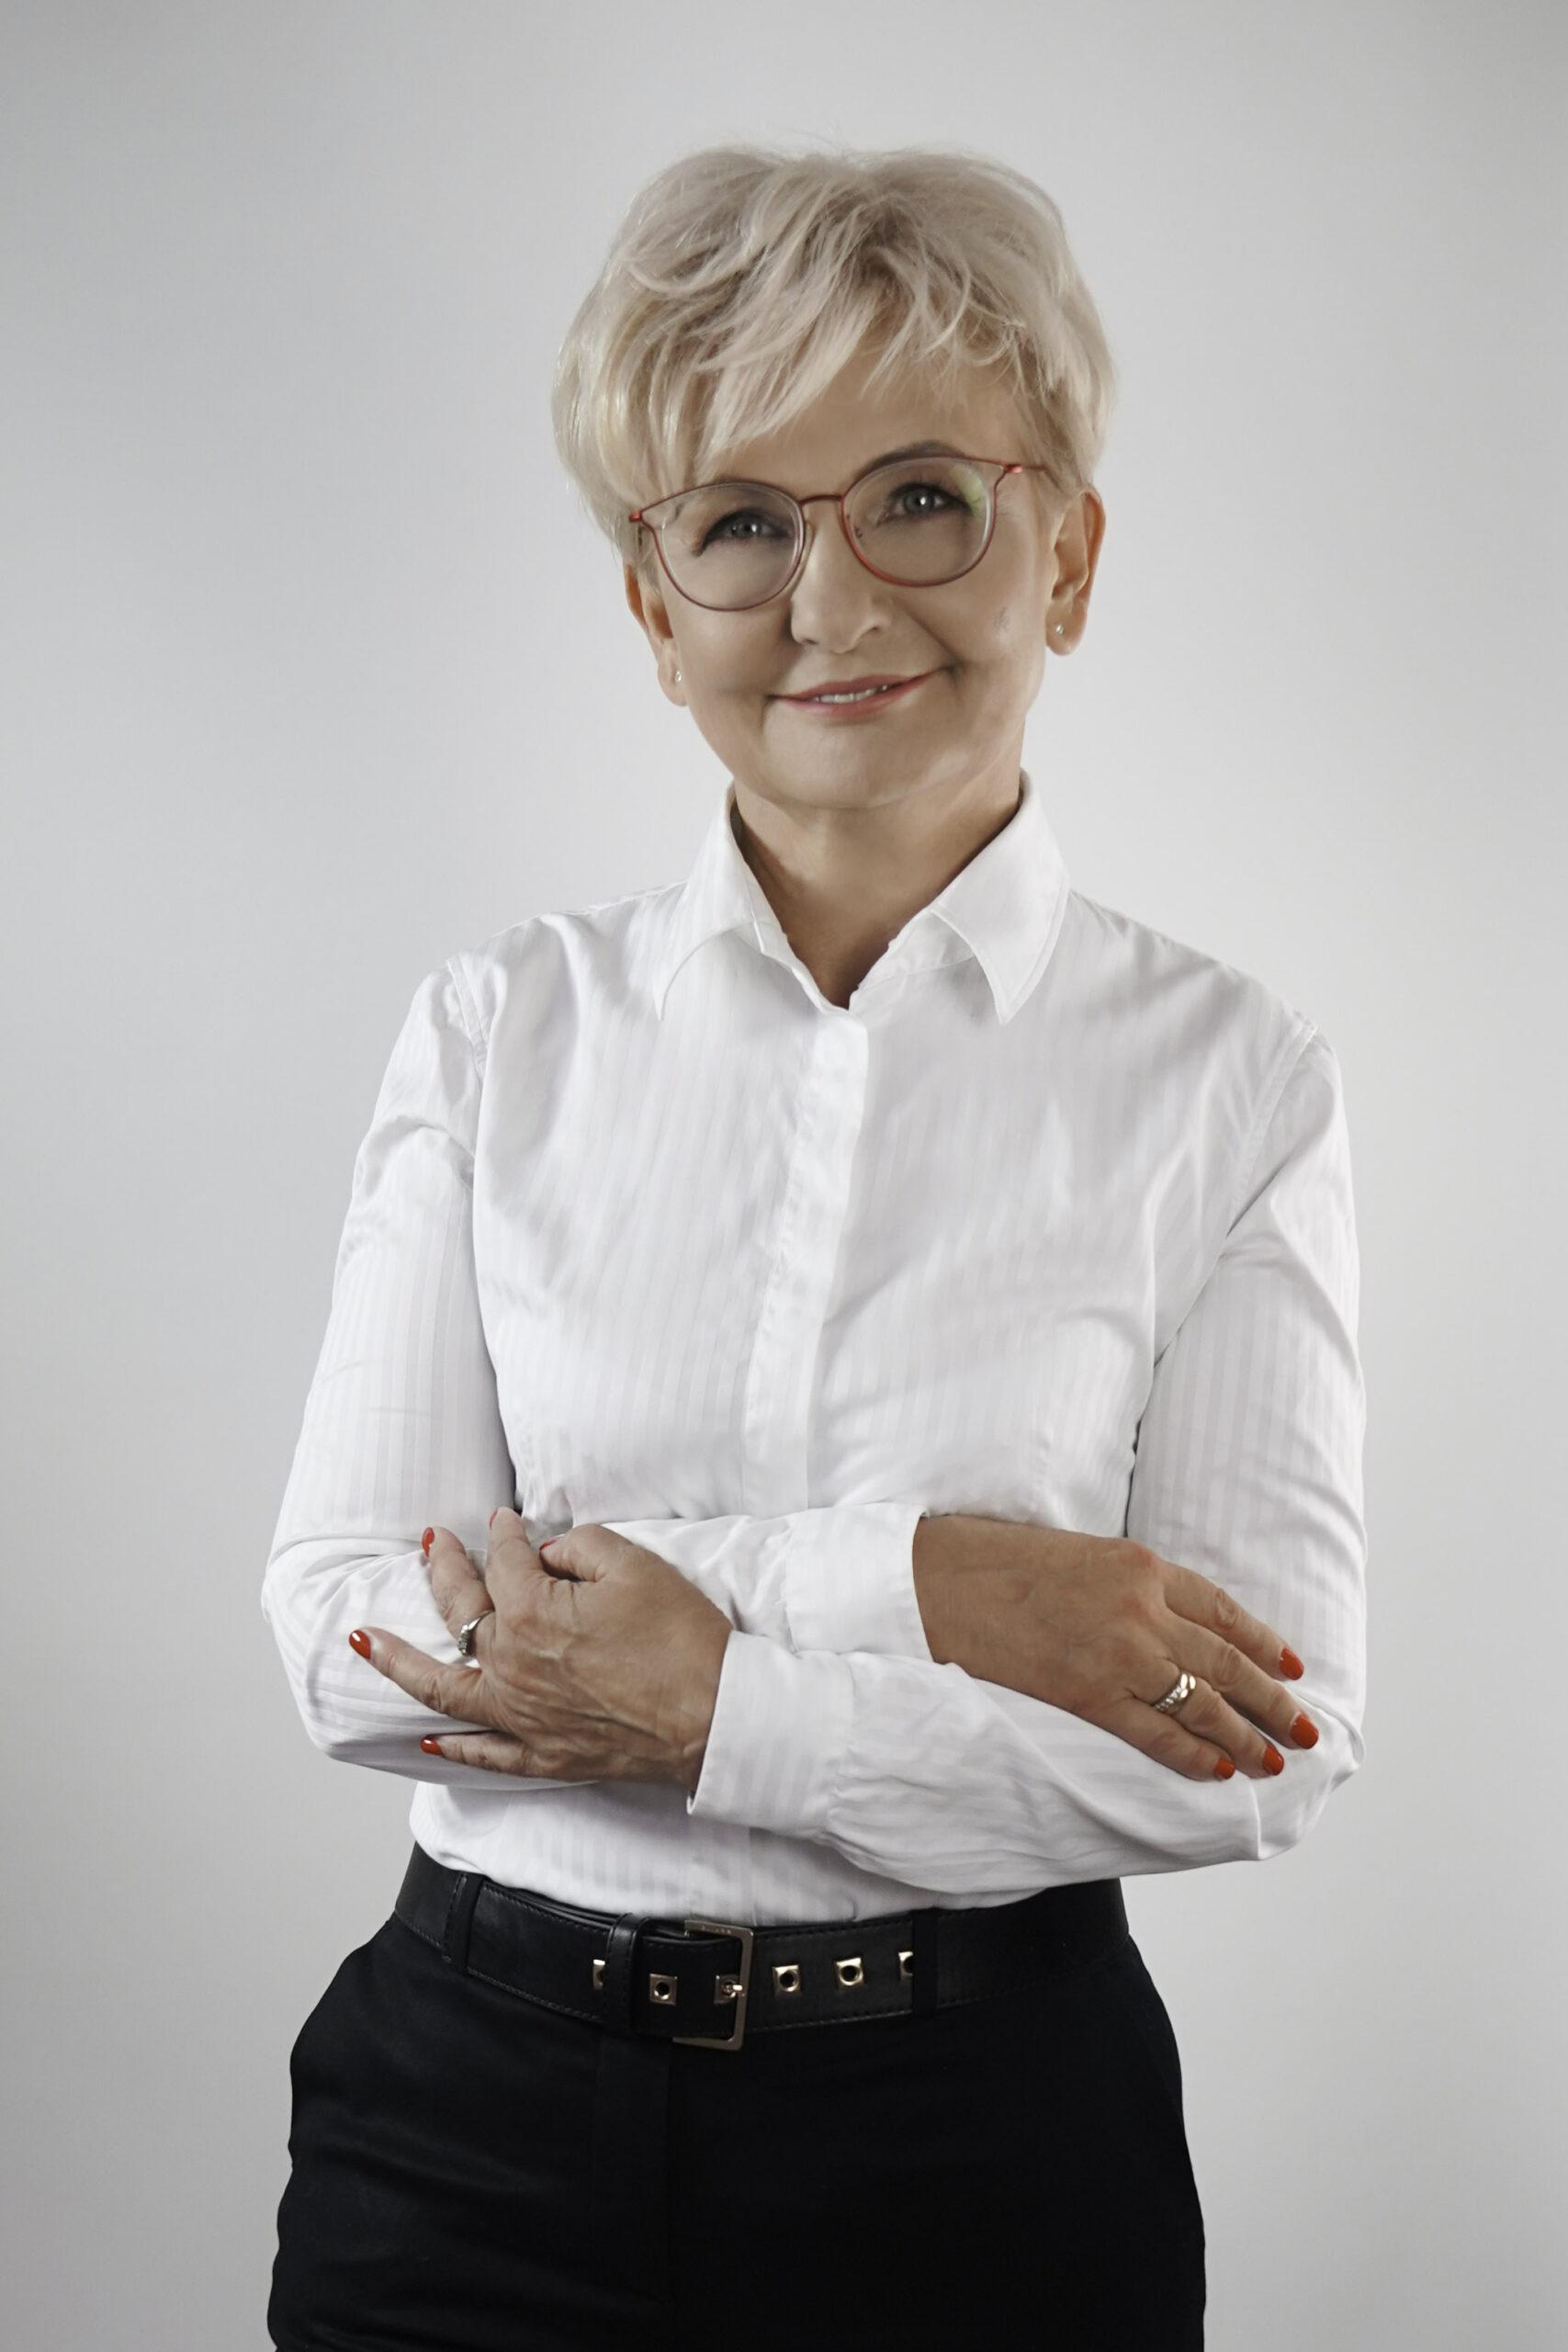 Poland – Iwona Krystyna Michałek